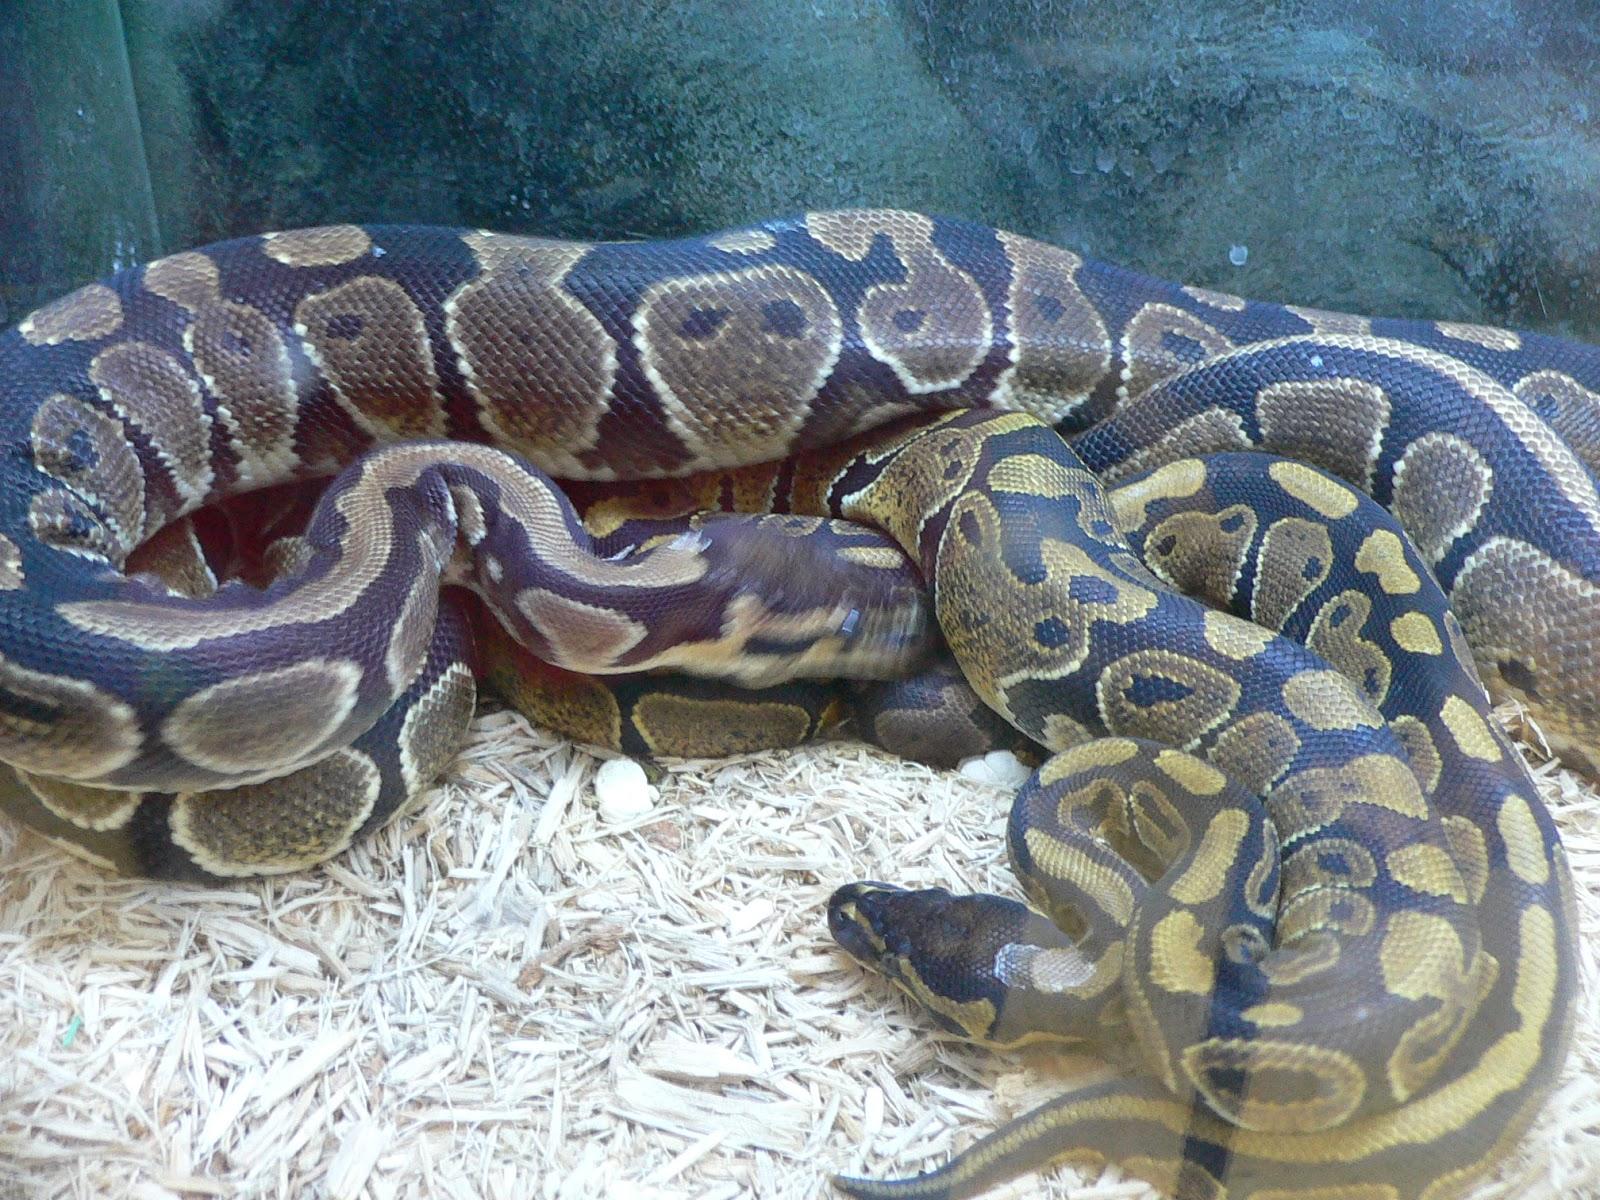 snake - photo #26